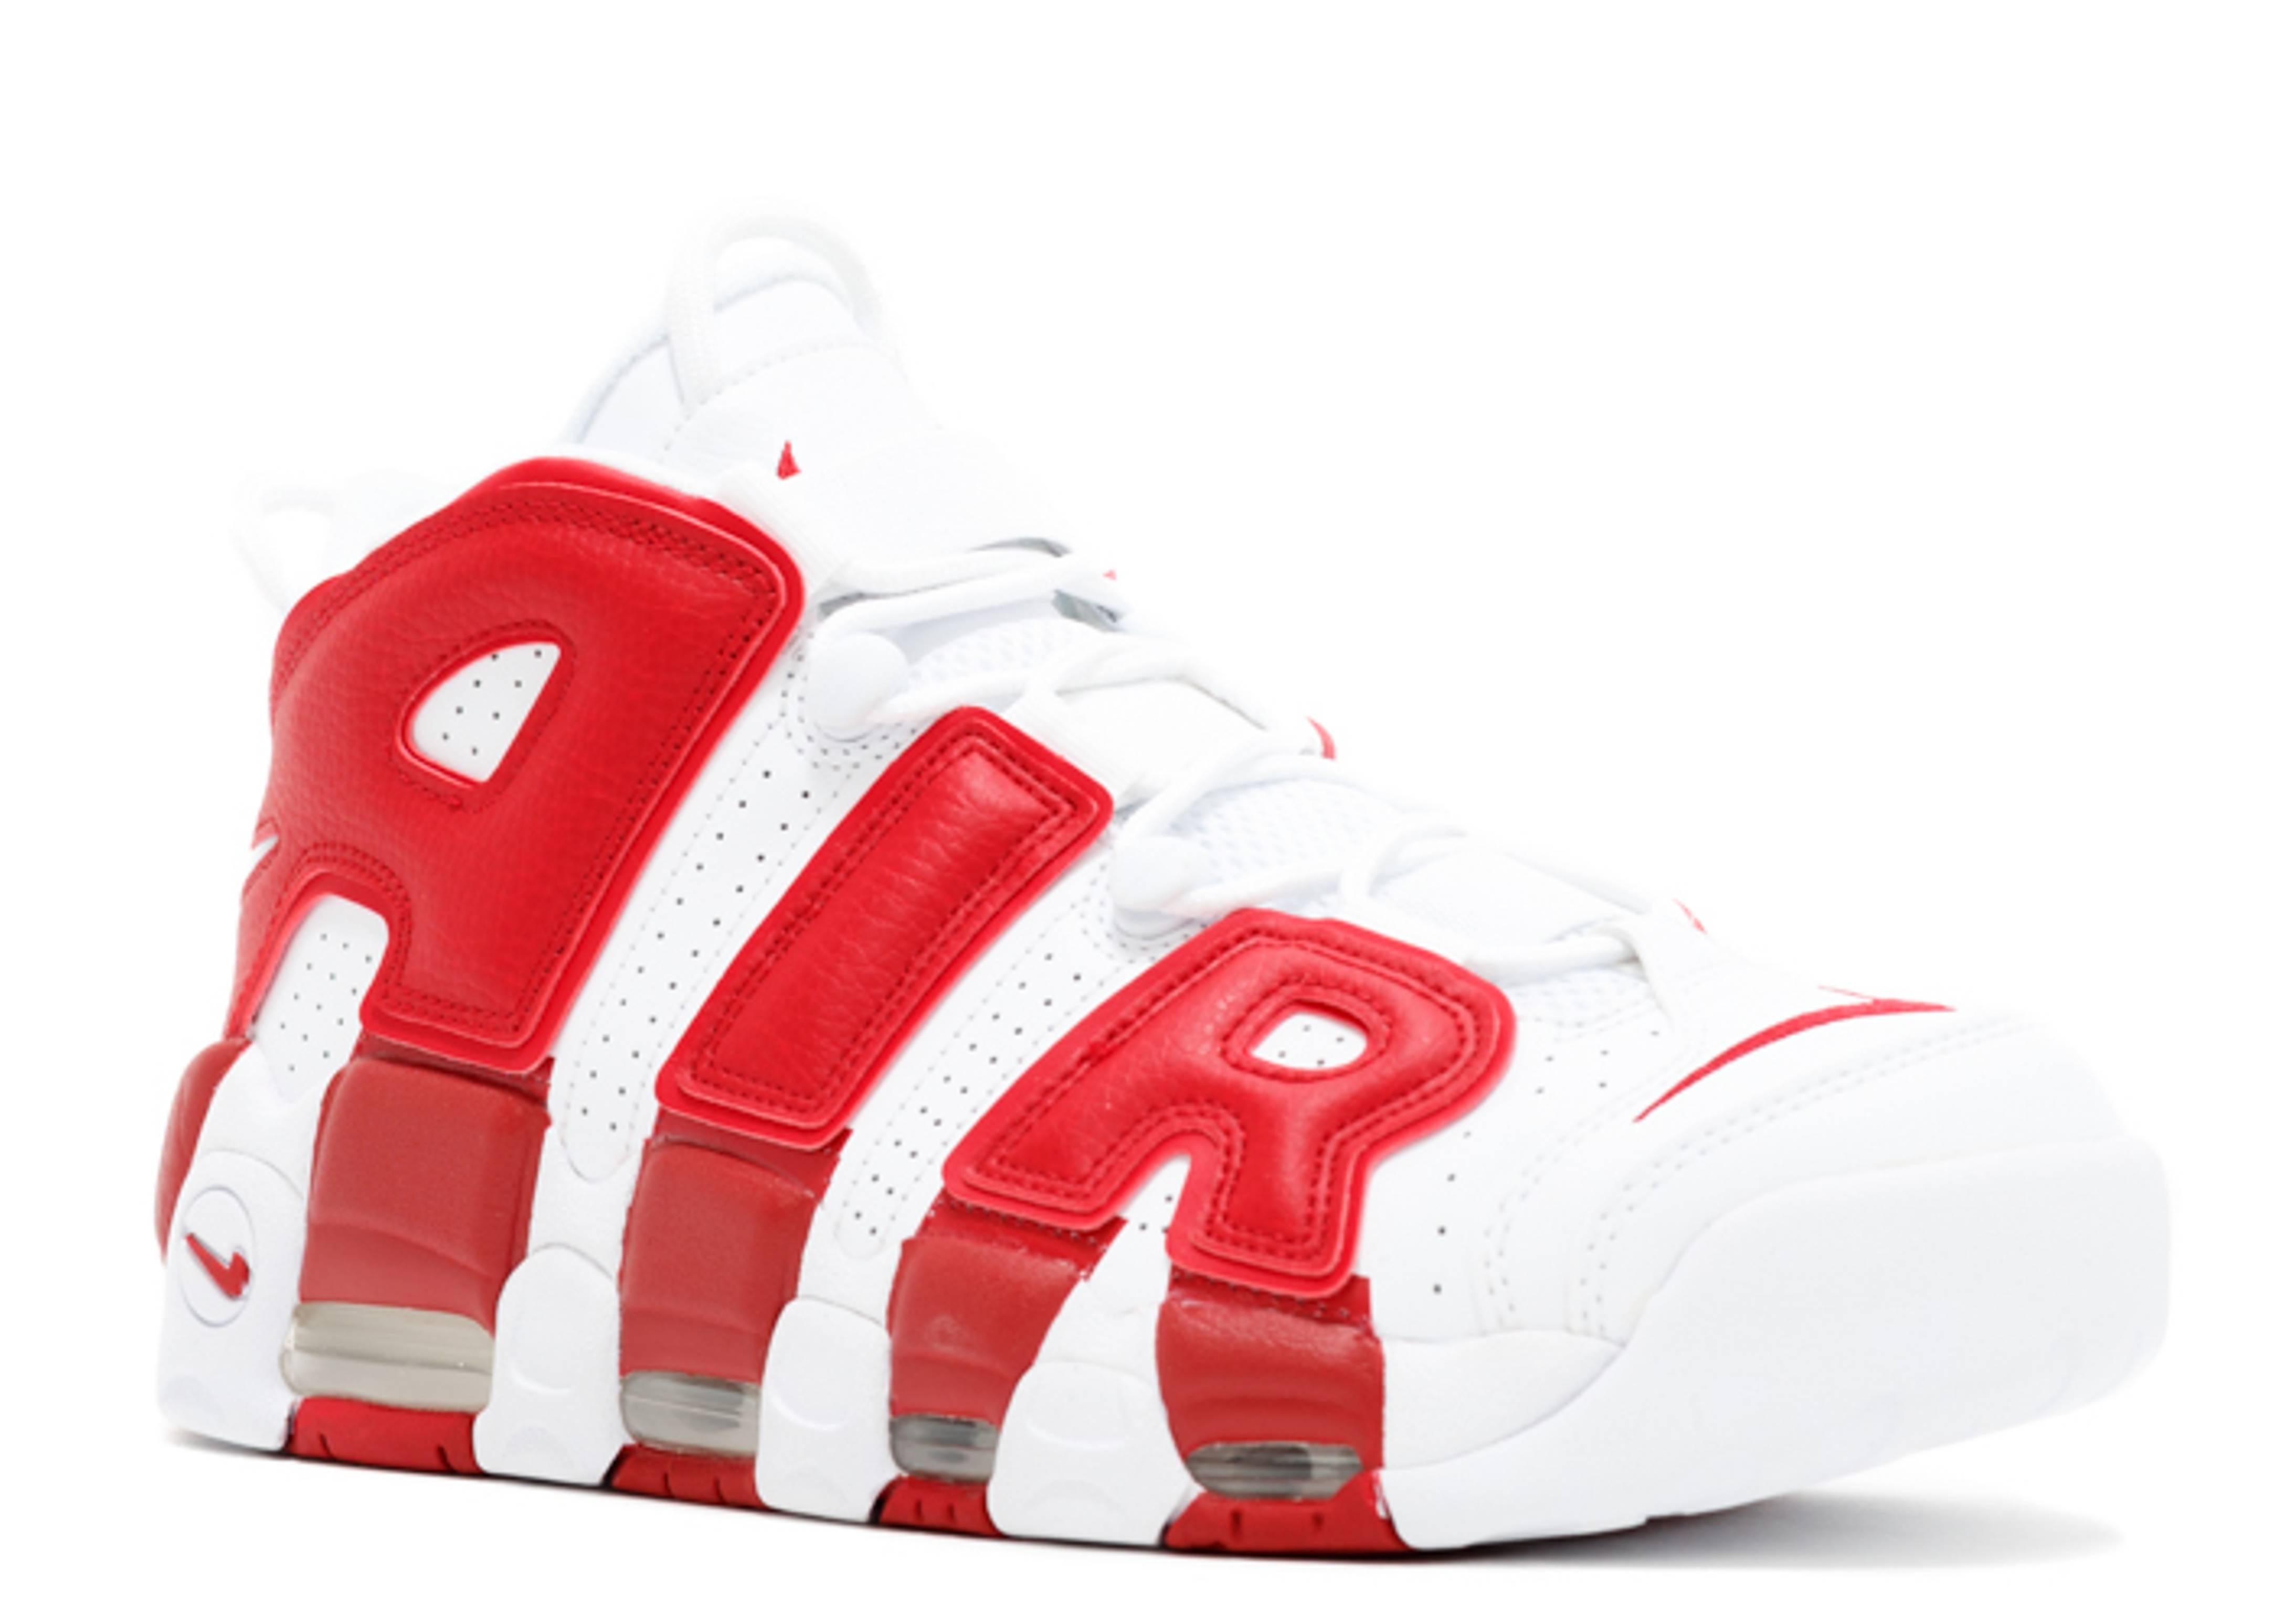 tubo Concurso Eficacia  Air More Uptempo 'White Red' - Nike - 414962 100 - white/white-gym red |  Flight Club